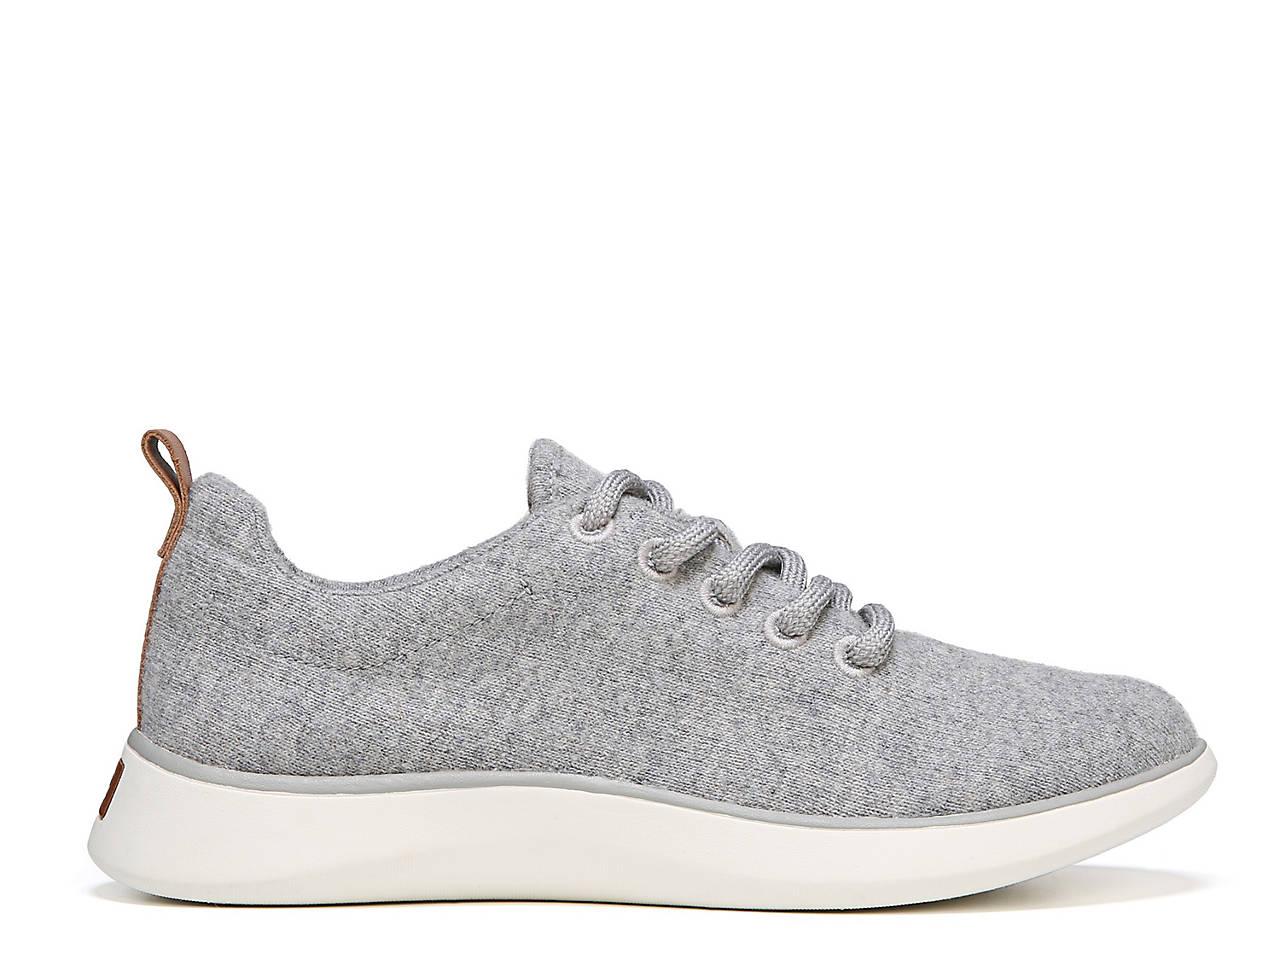 8e2076554e9 Dr. Scholl s Freestep Sneaker Women s Shoes